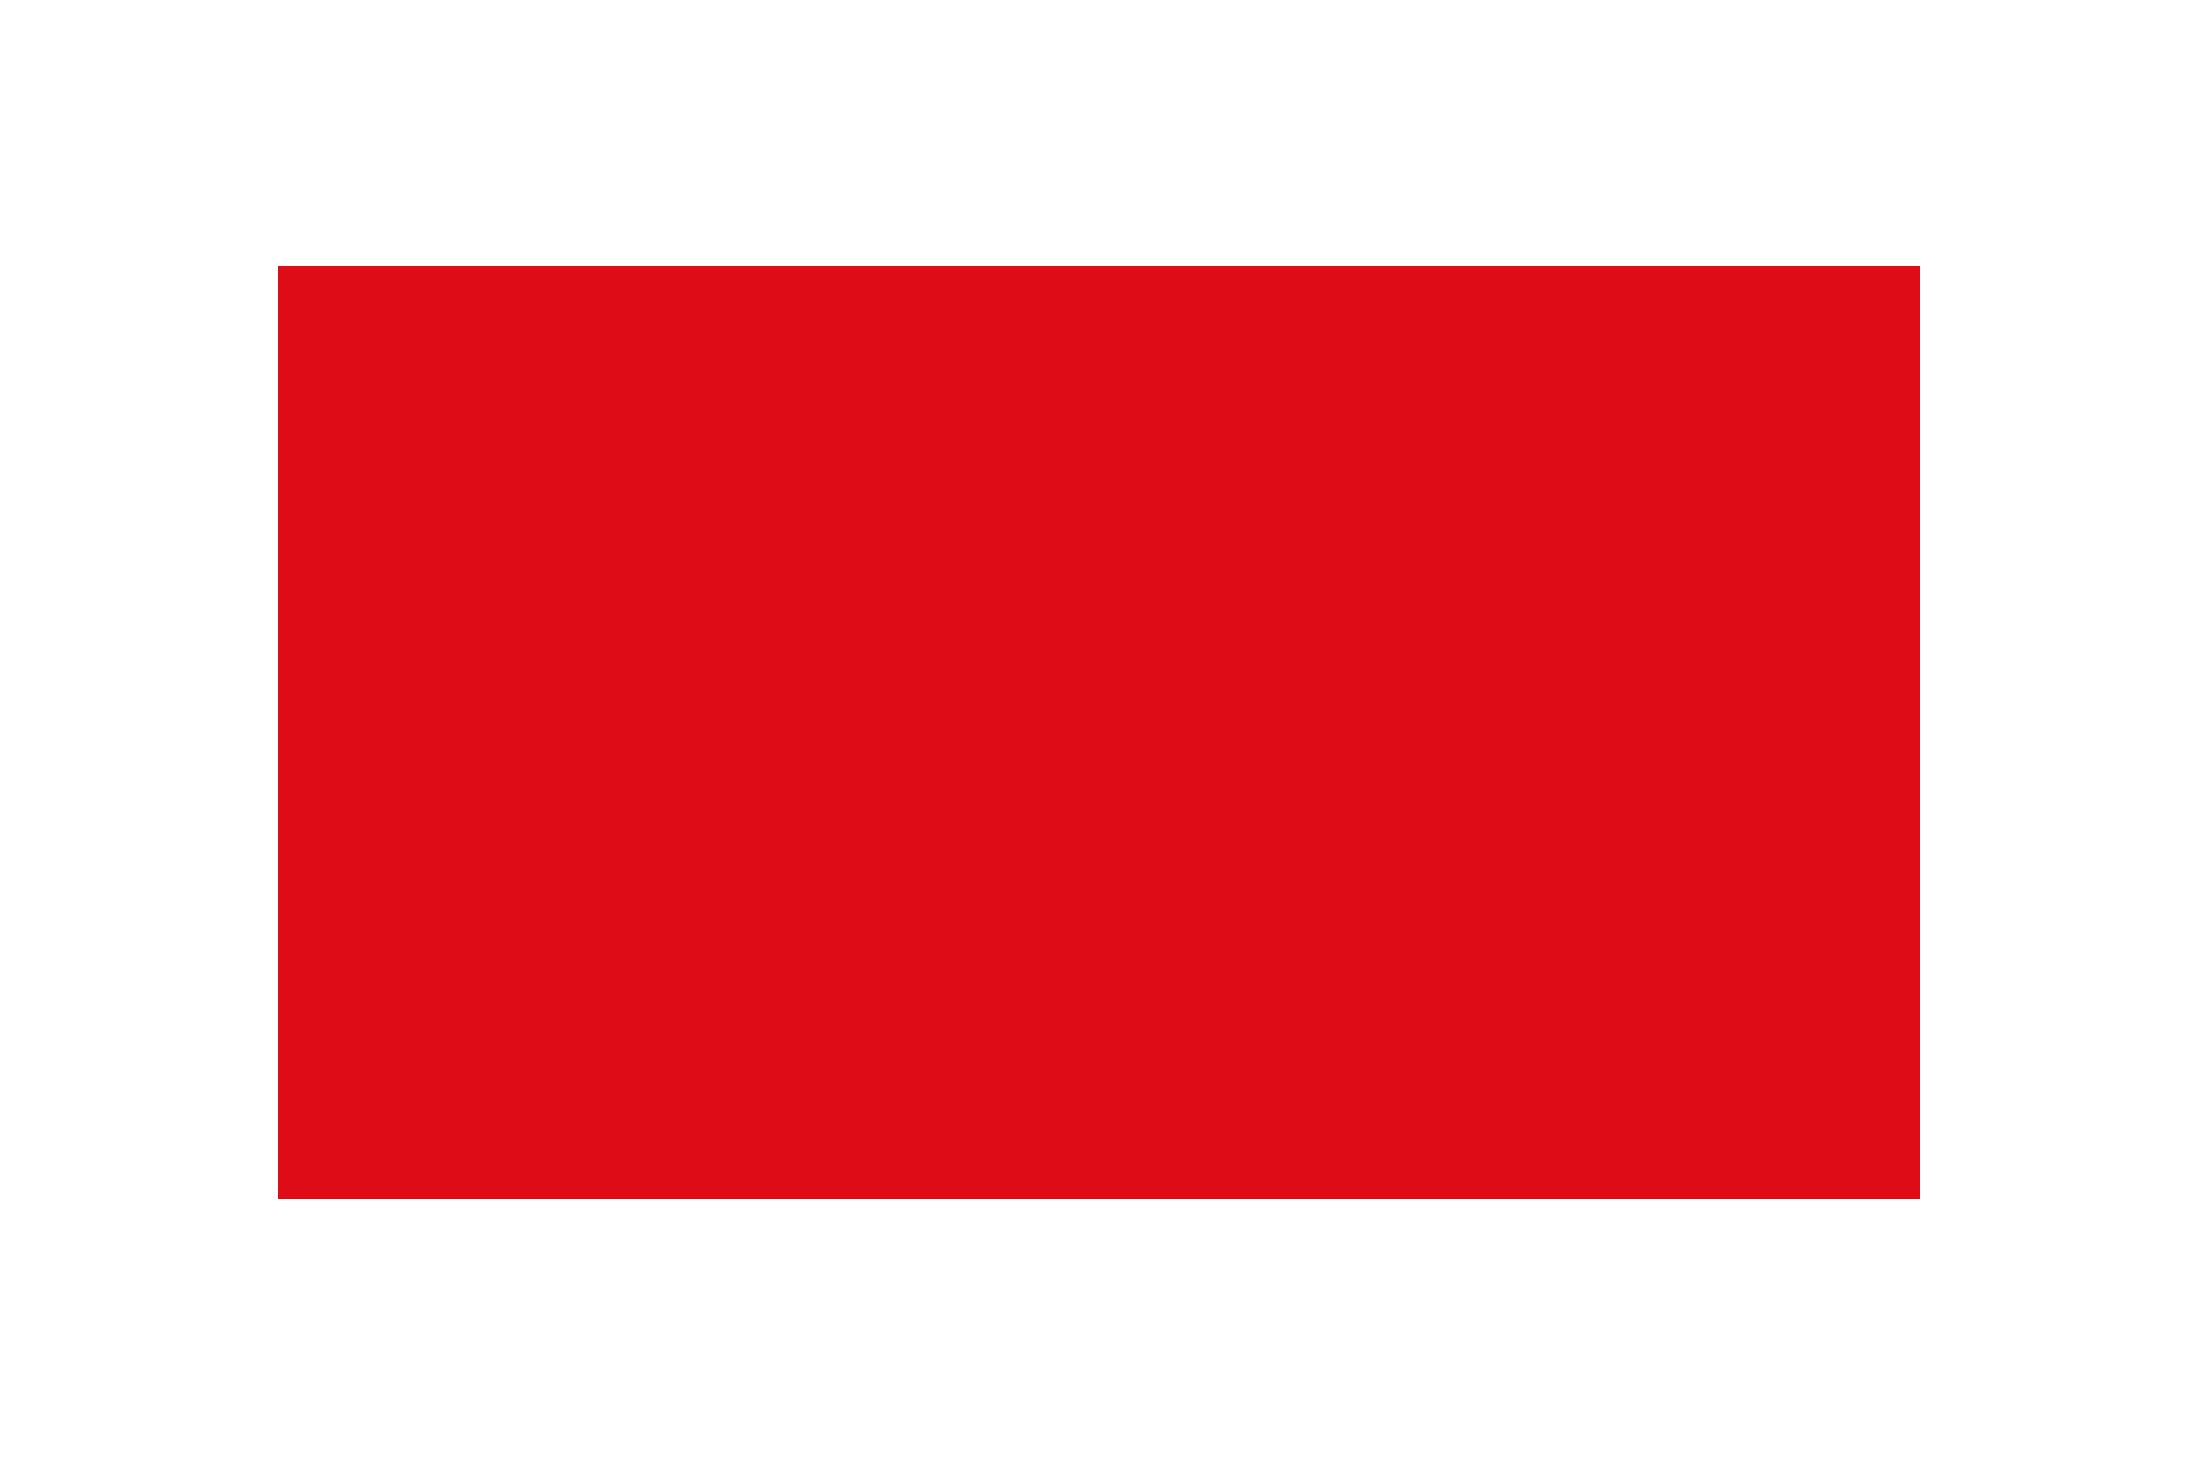 Grunge 2020 label PSD